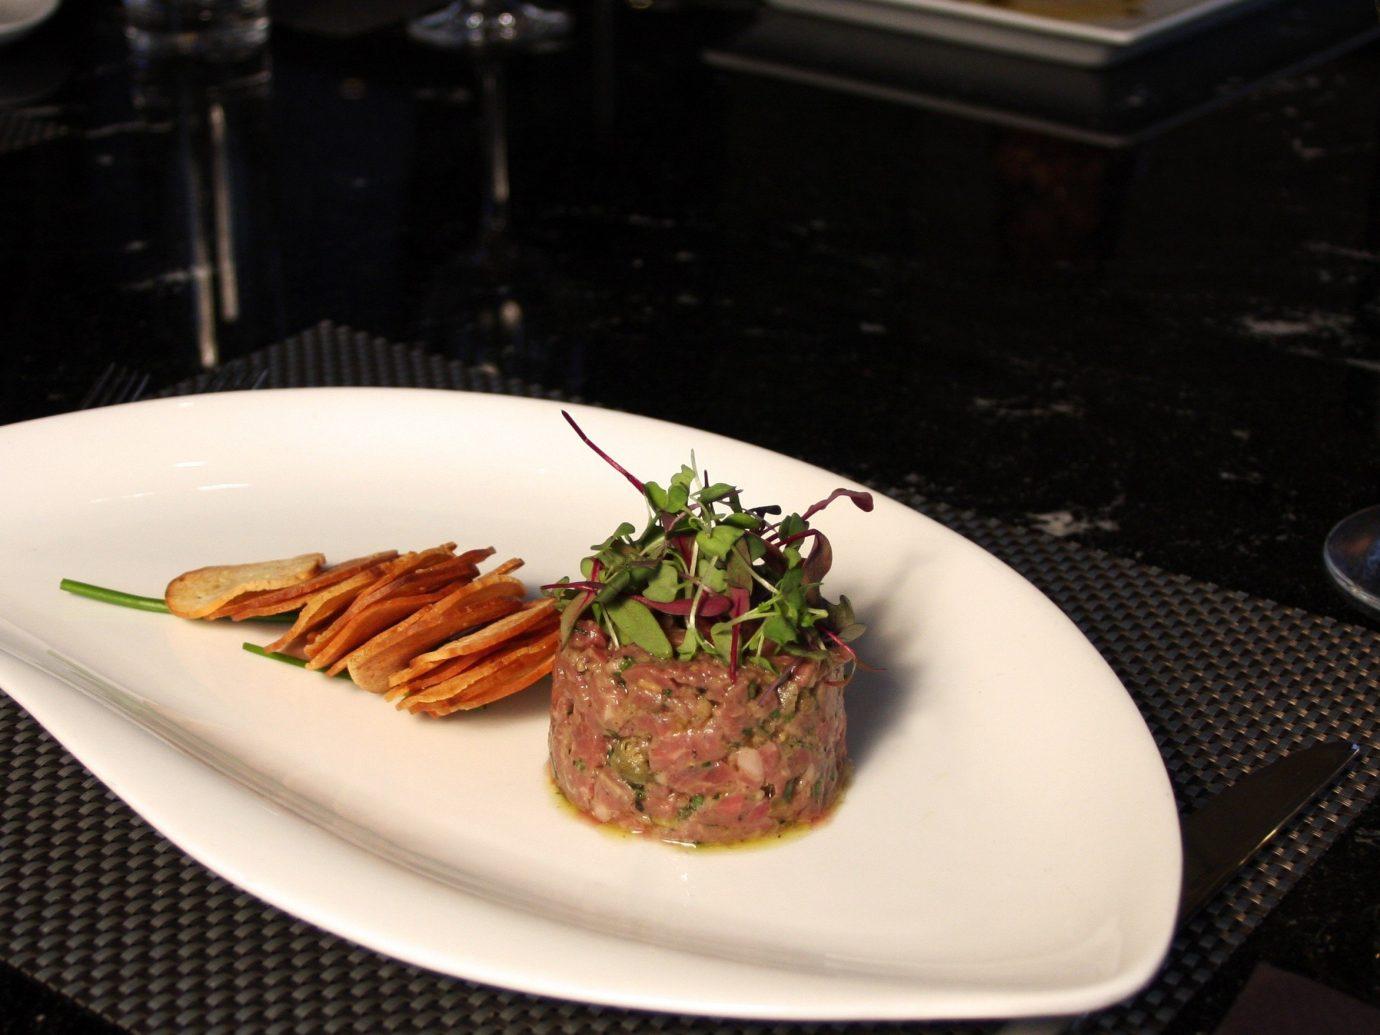 Travel Tips plate table food indoor meal dish cuisine brunch white steak venison meat beef tenderloin dinner piece de resistance